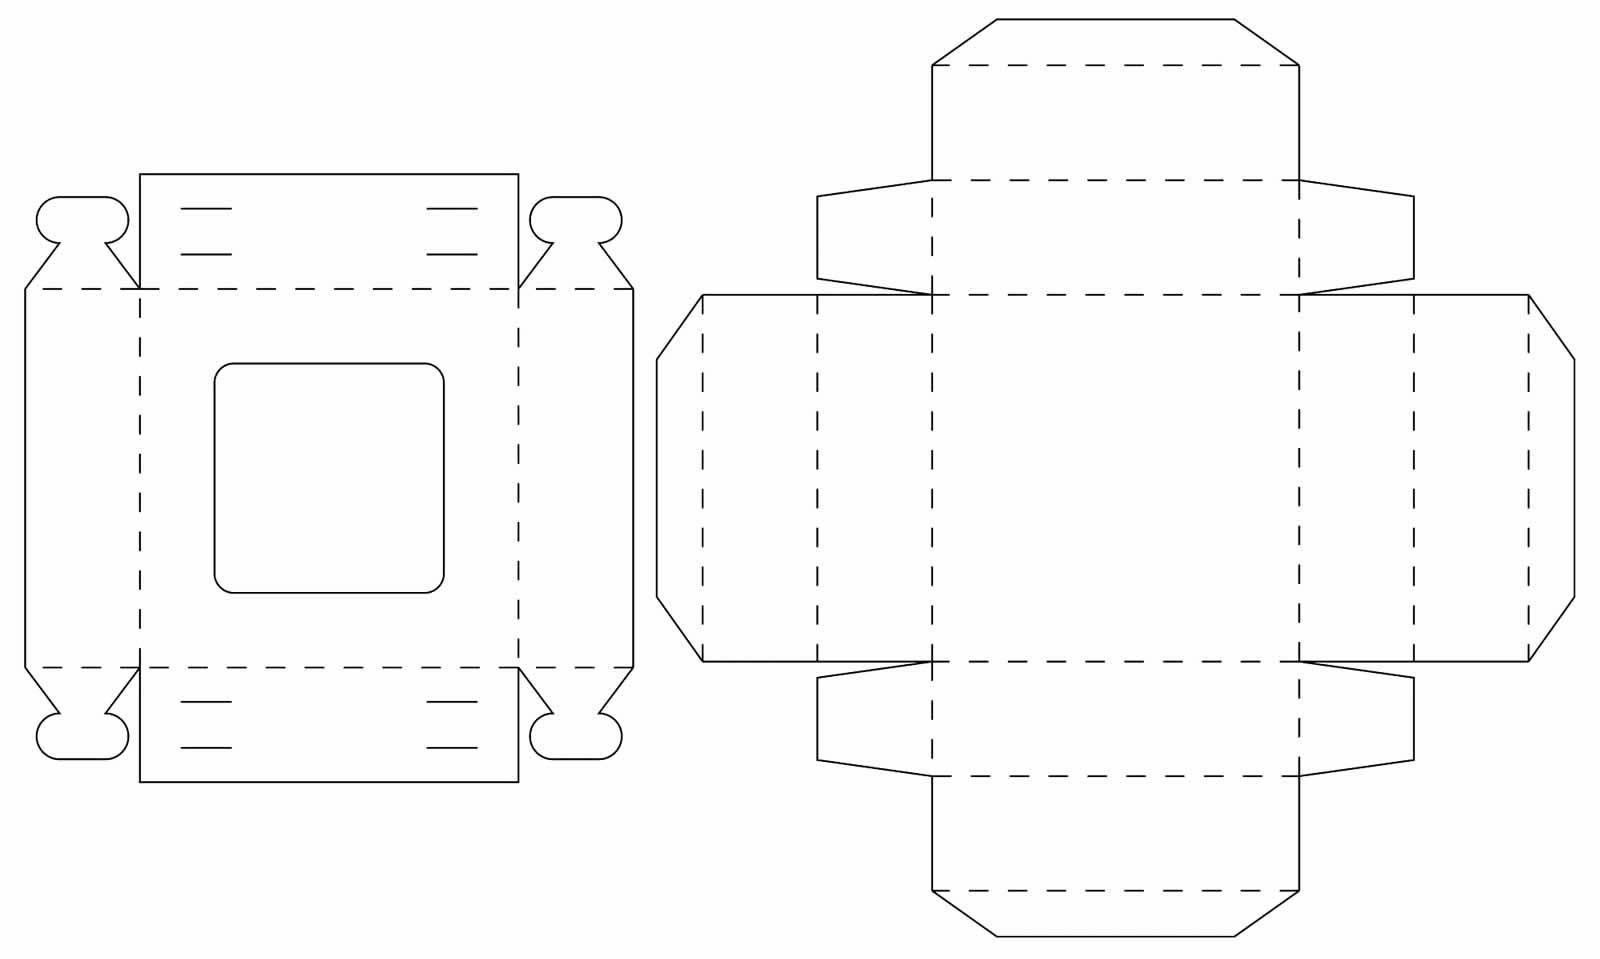 Molde para caixa de papel de sabonete